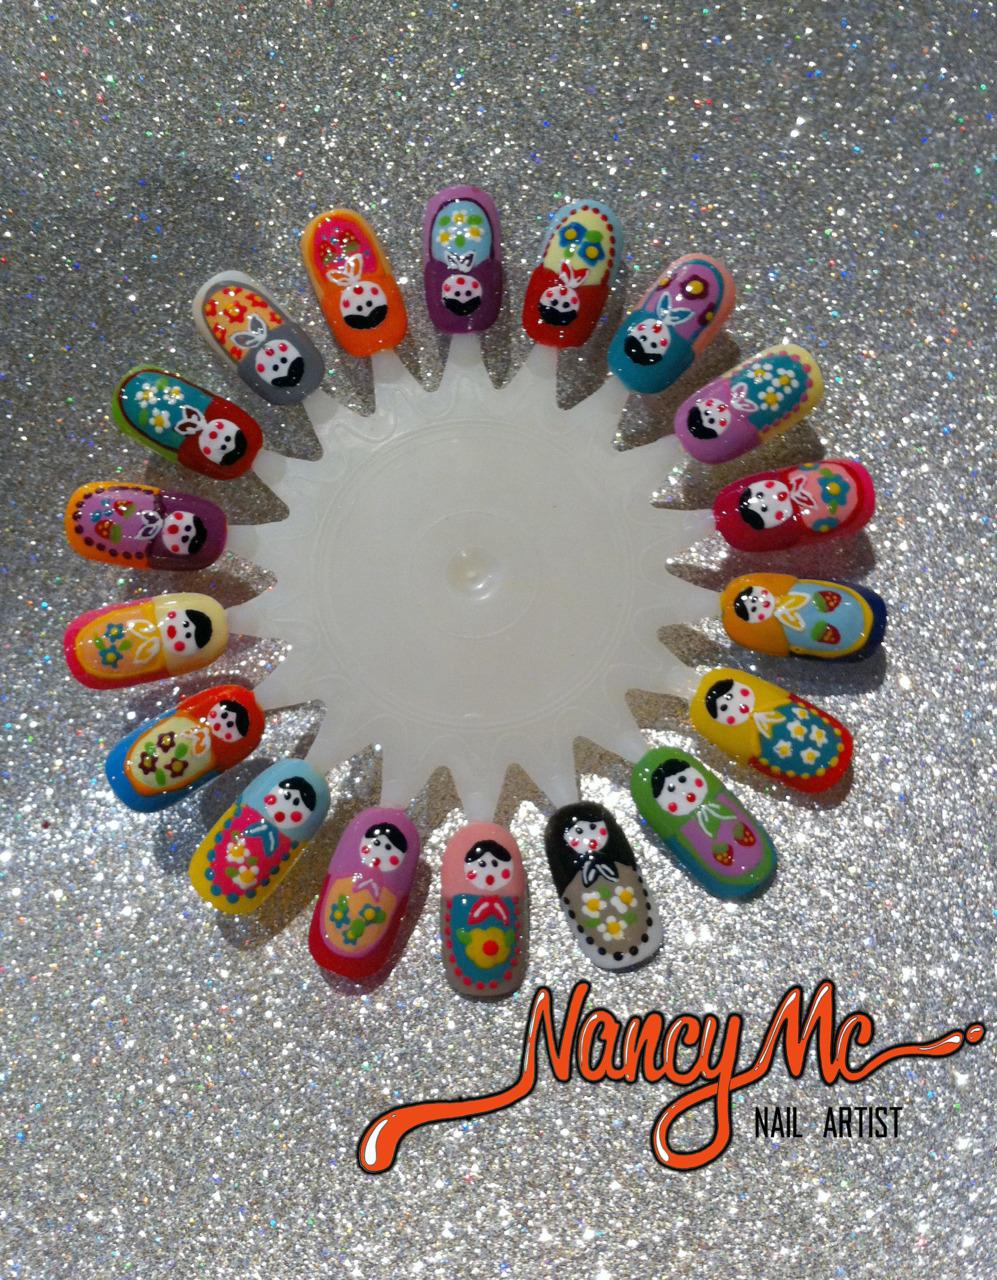 Welcome To My Life. ʕ•ᴥ•ʔ ♥: OMG Katy Perry Inspired nail art ...